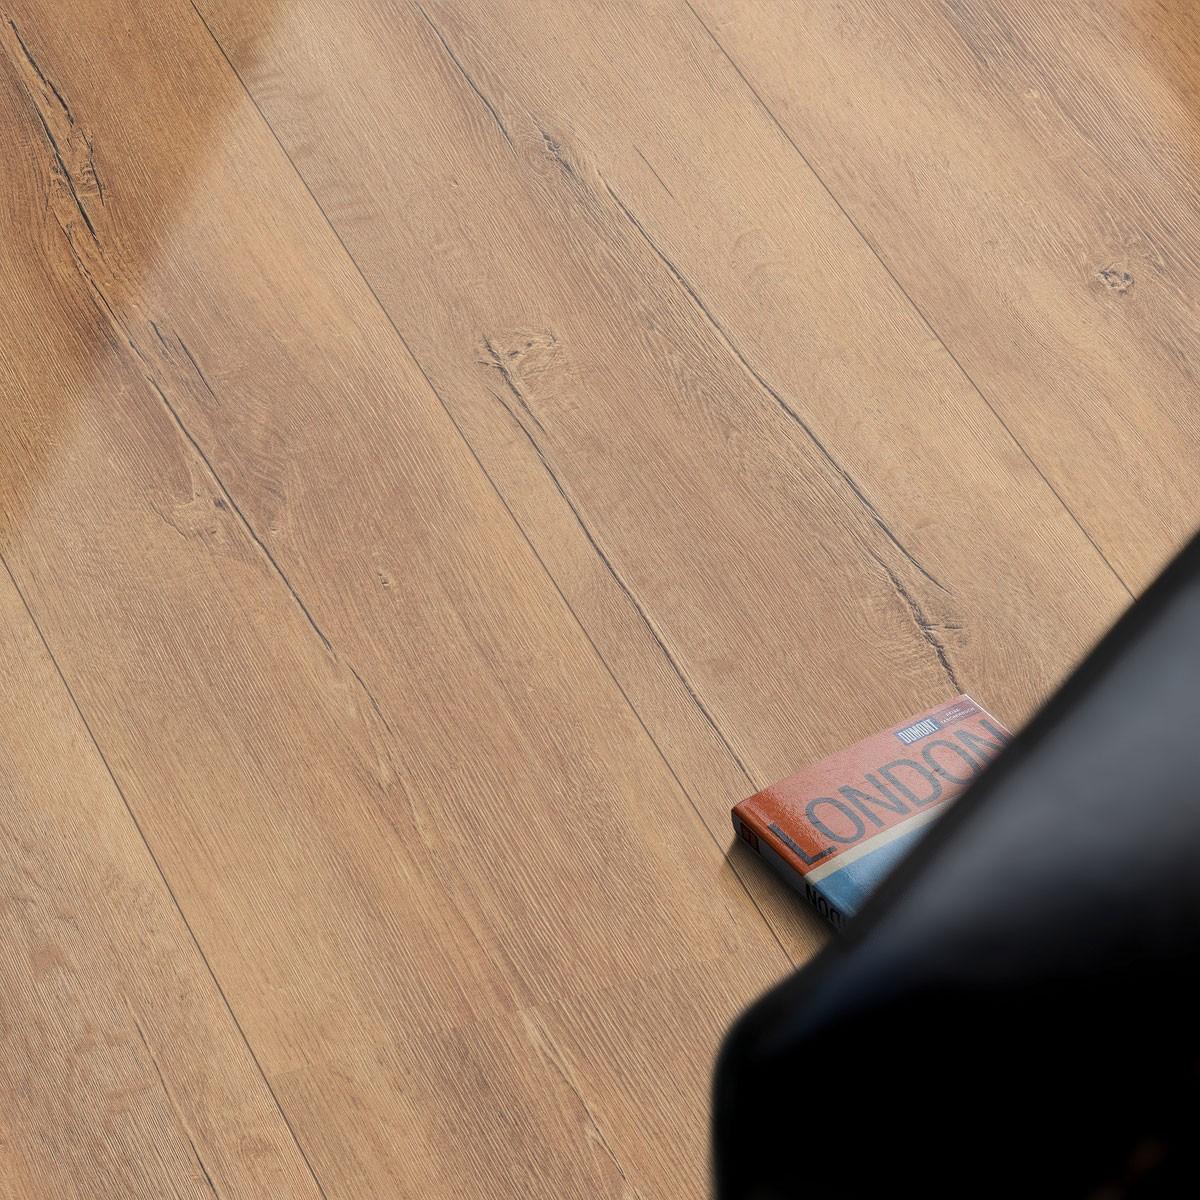 egger pro kingsize laminat landhausdiele 1 stab eiche authentik verdon h1052 landhausdielen. Black Bedroom Furniture Sets. Home Design Ideas